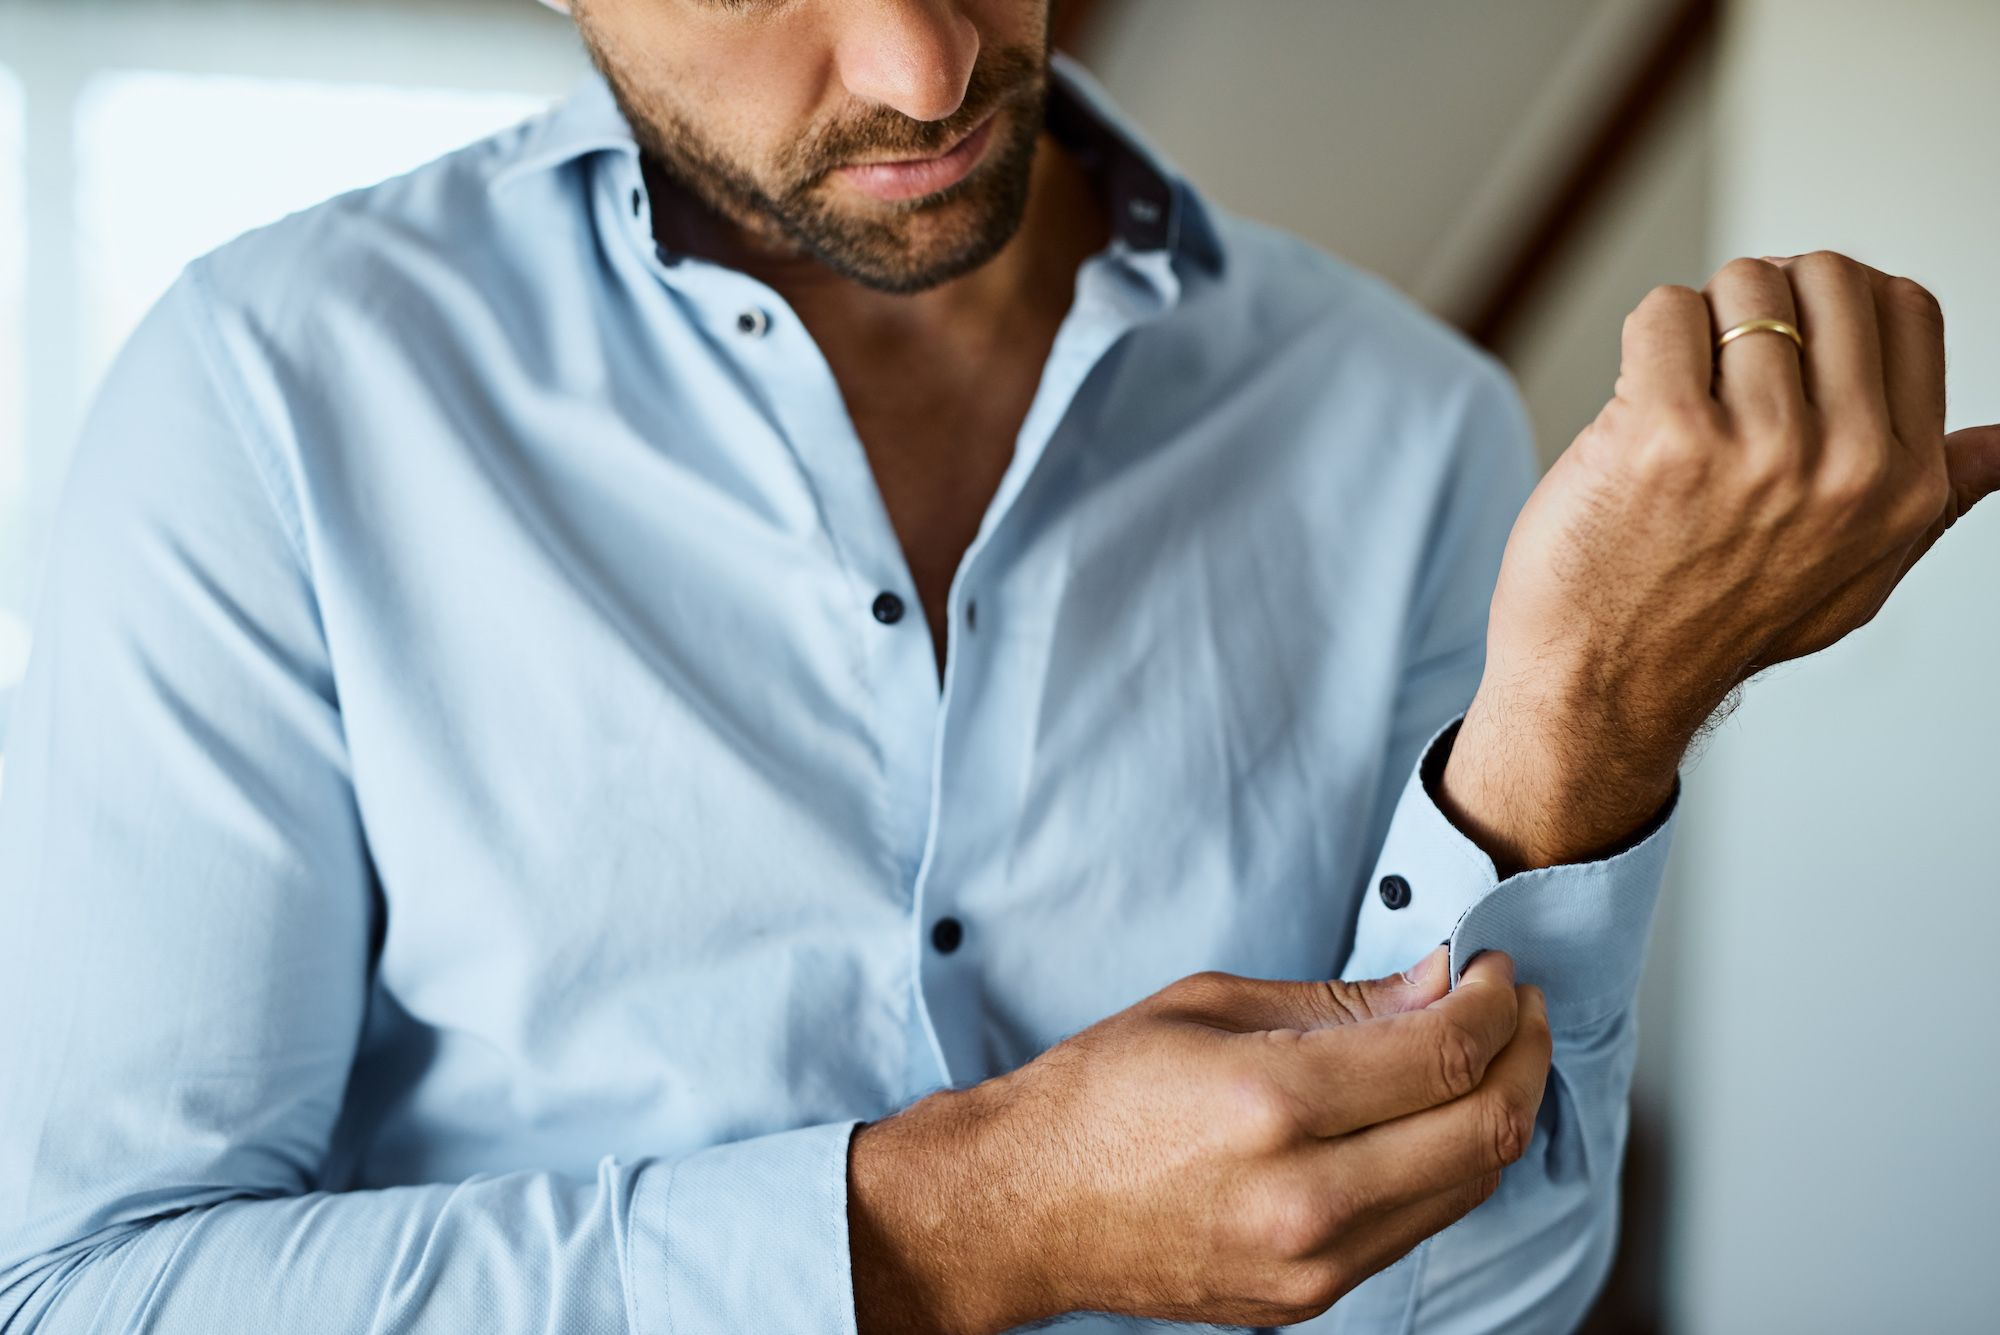 Black Silk Shirt Custom made to measure hand tailored bespoke dress shirts